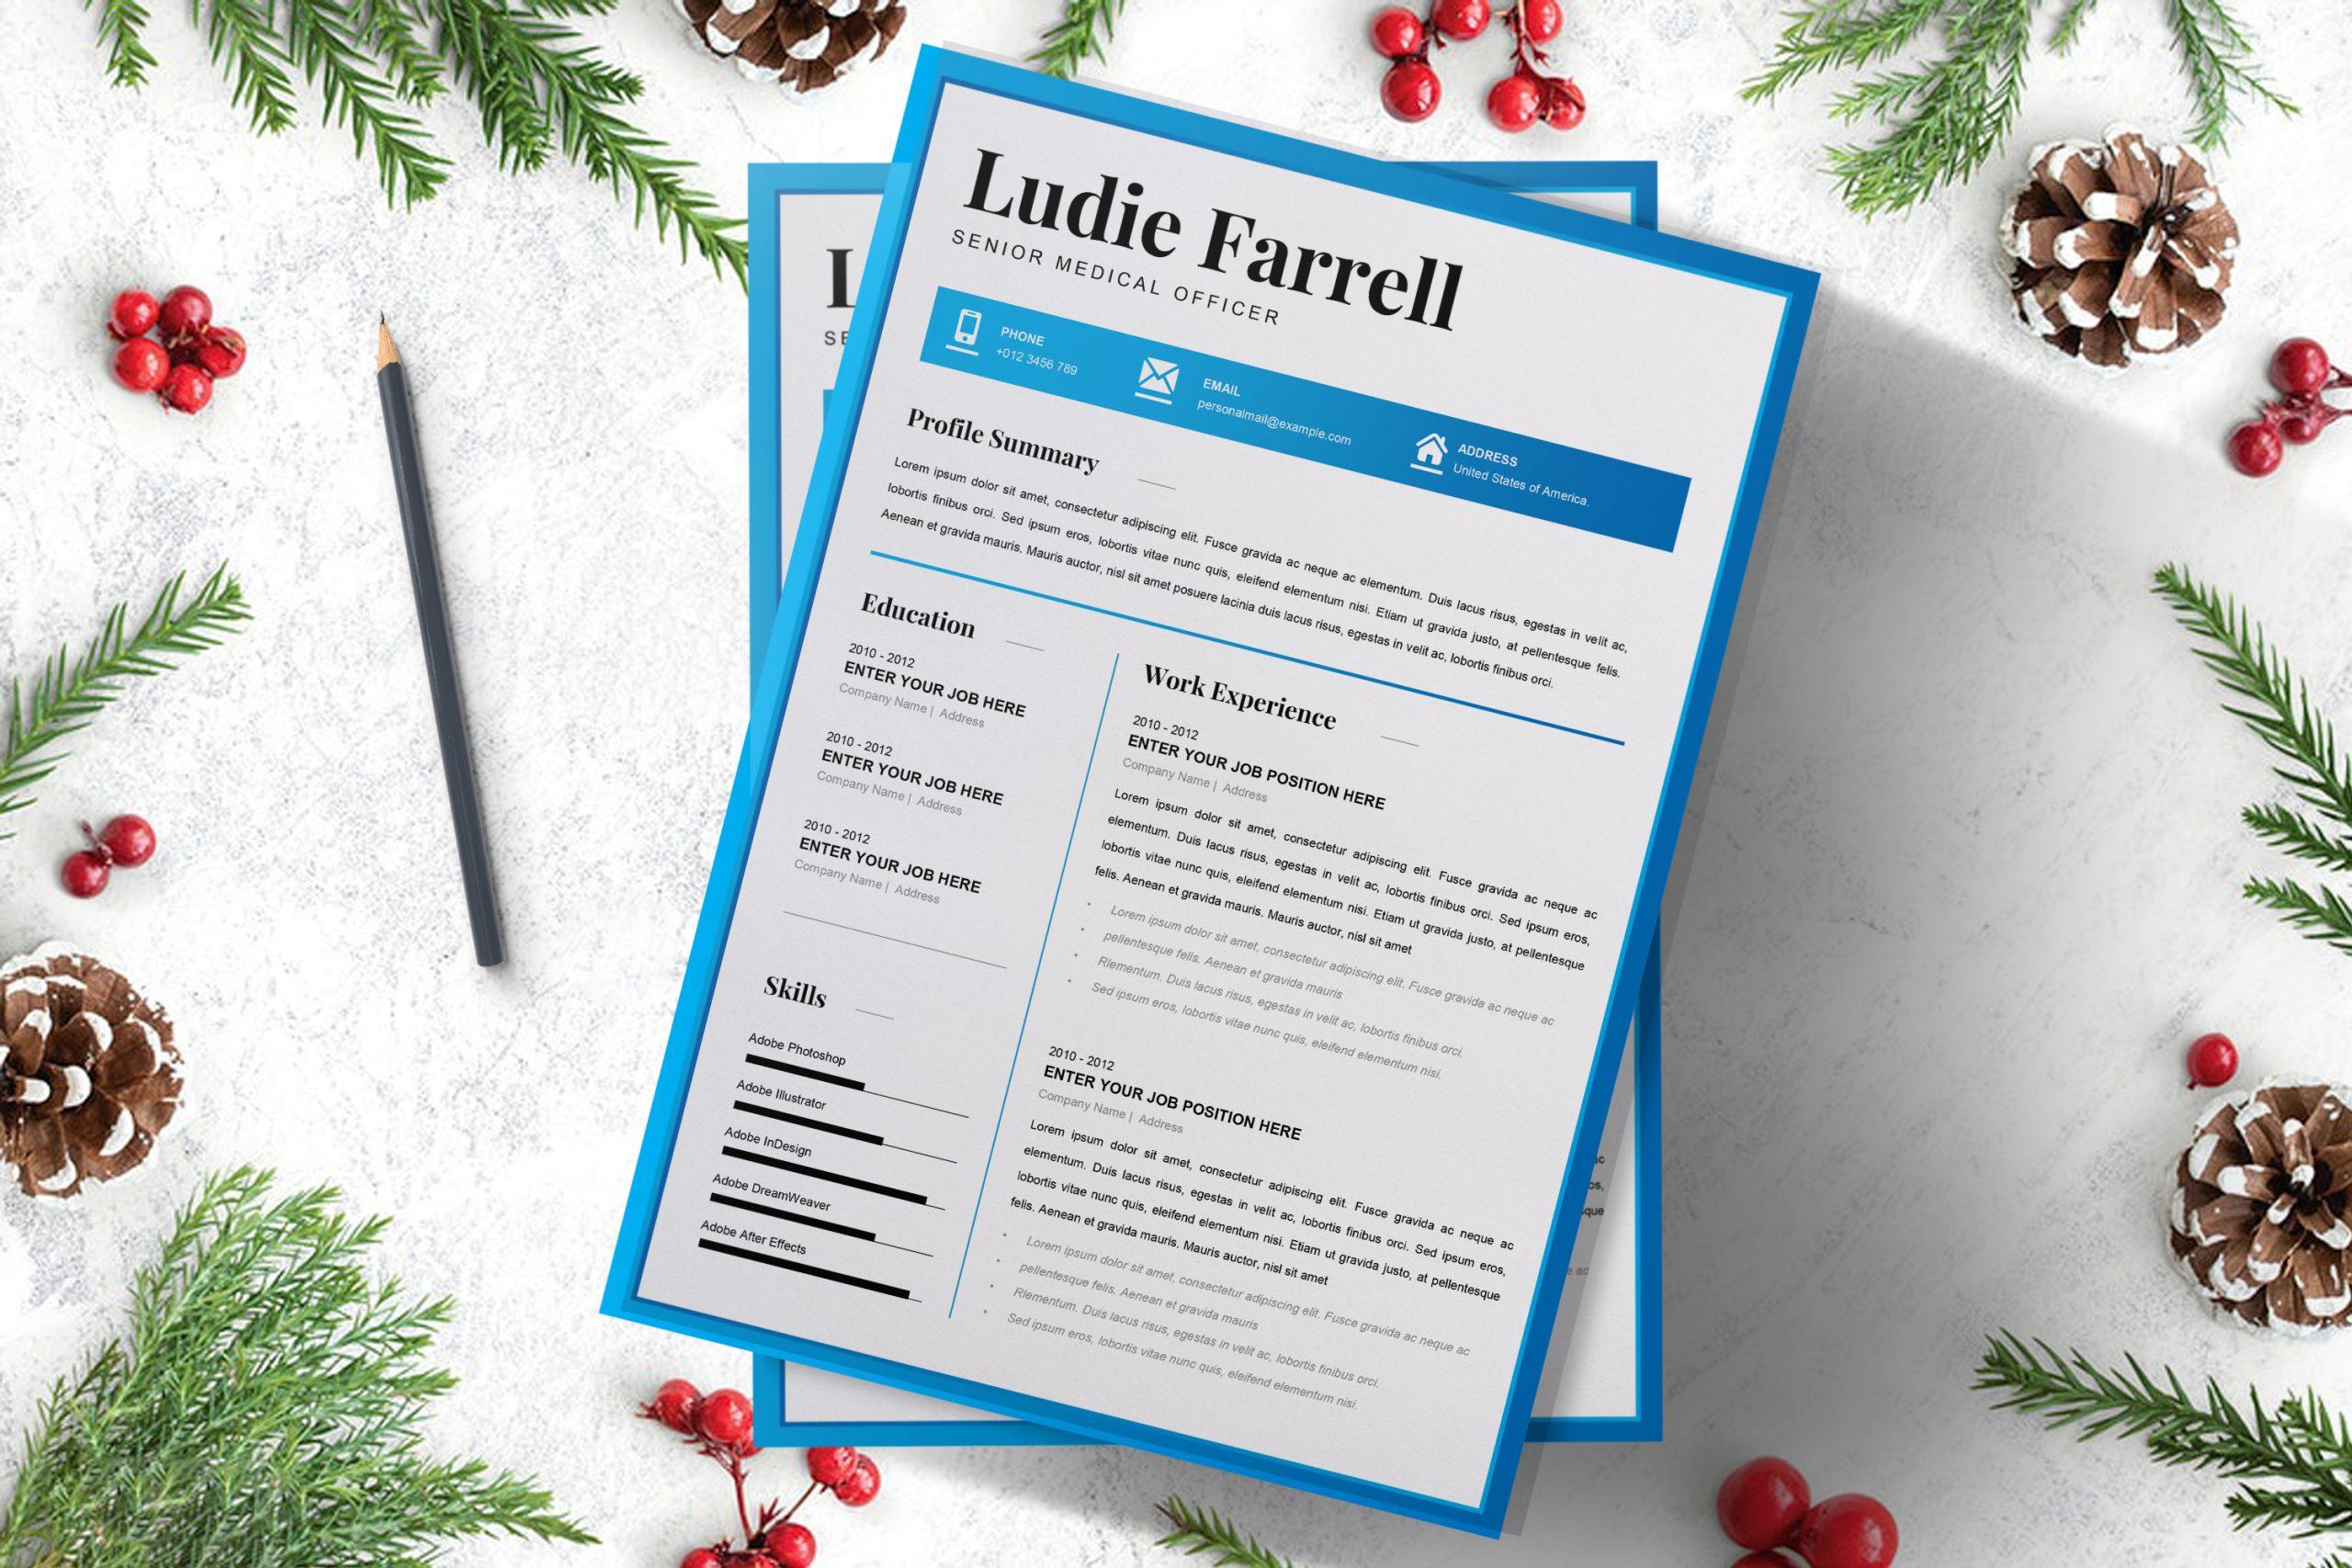 Senior-Medical-Officer-Resume-Template-to-download-4